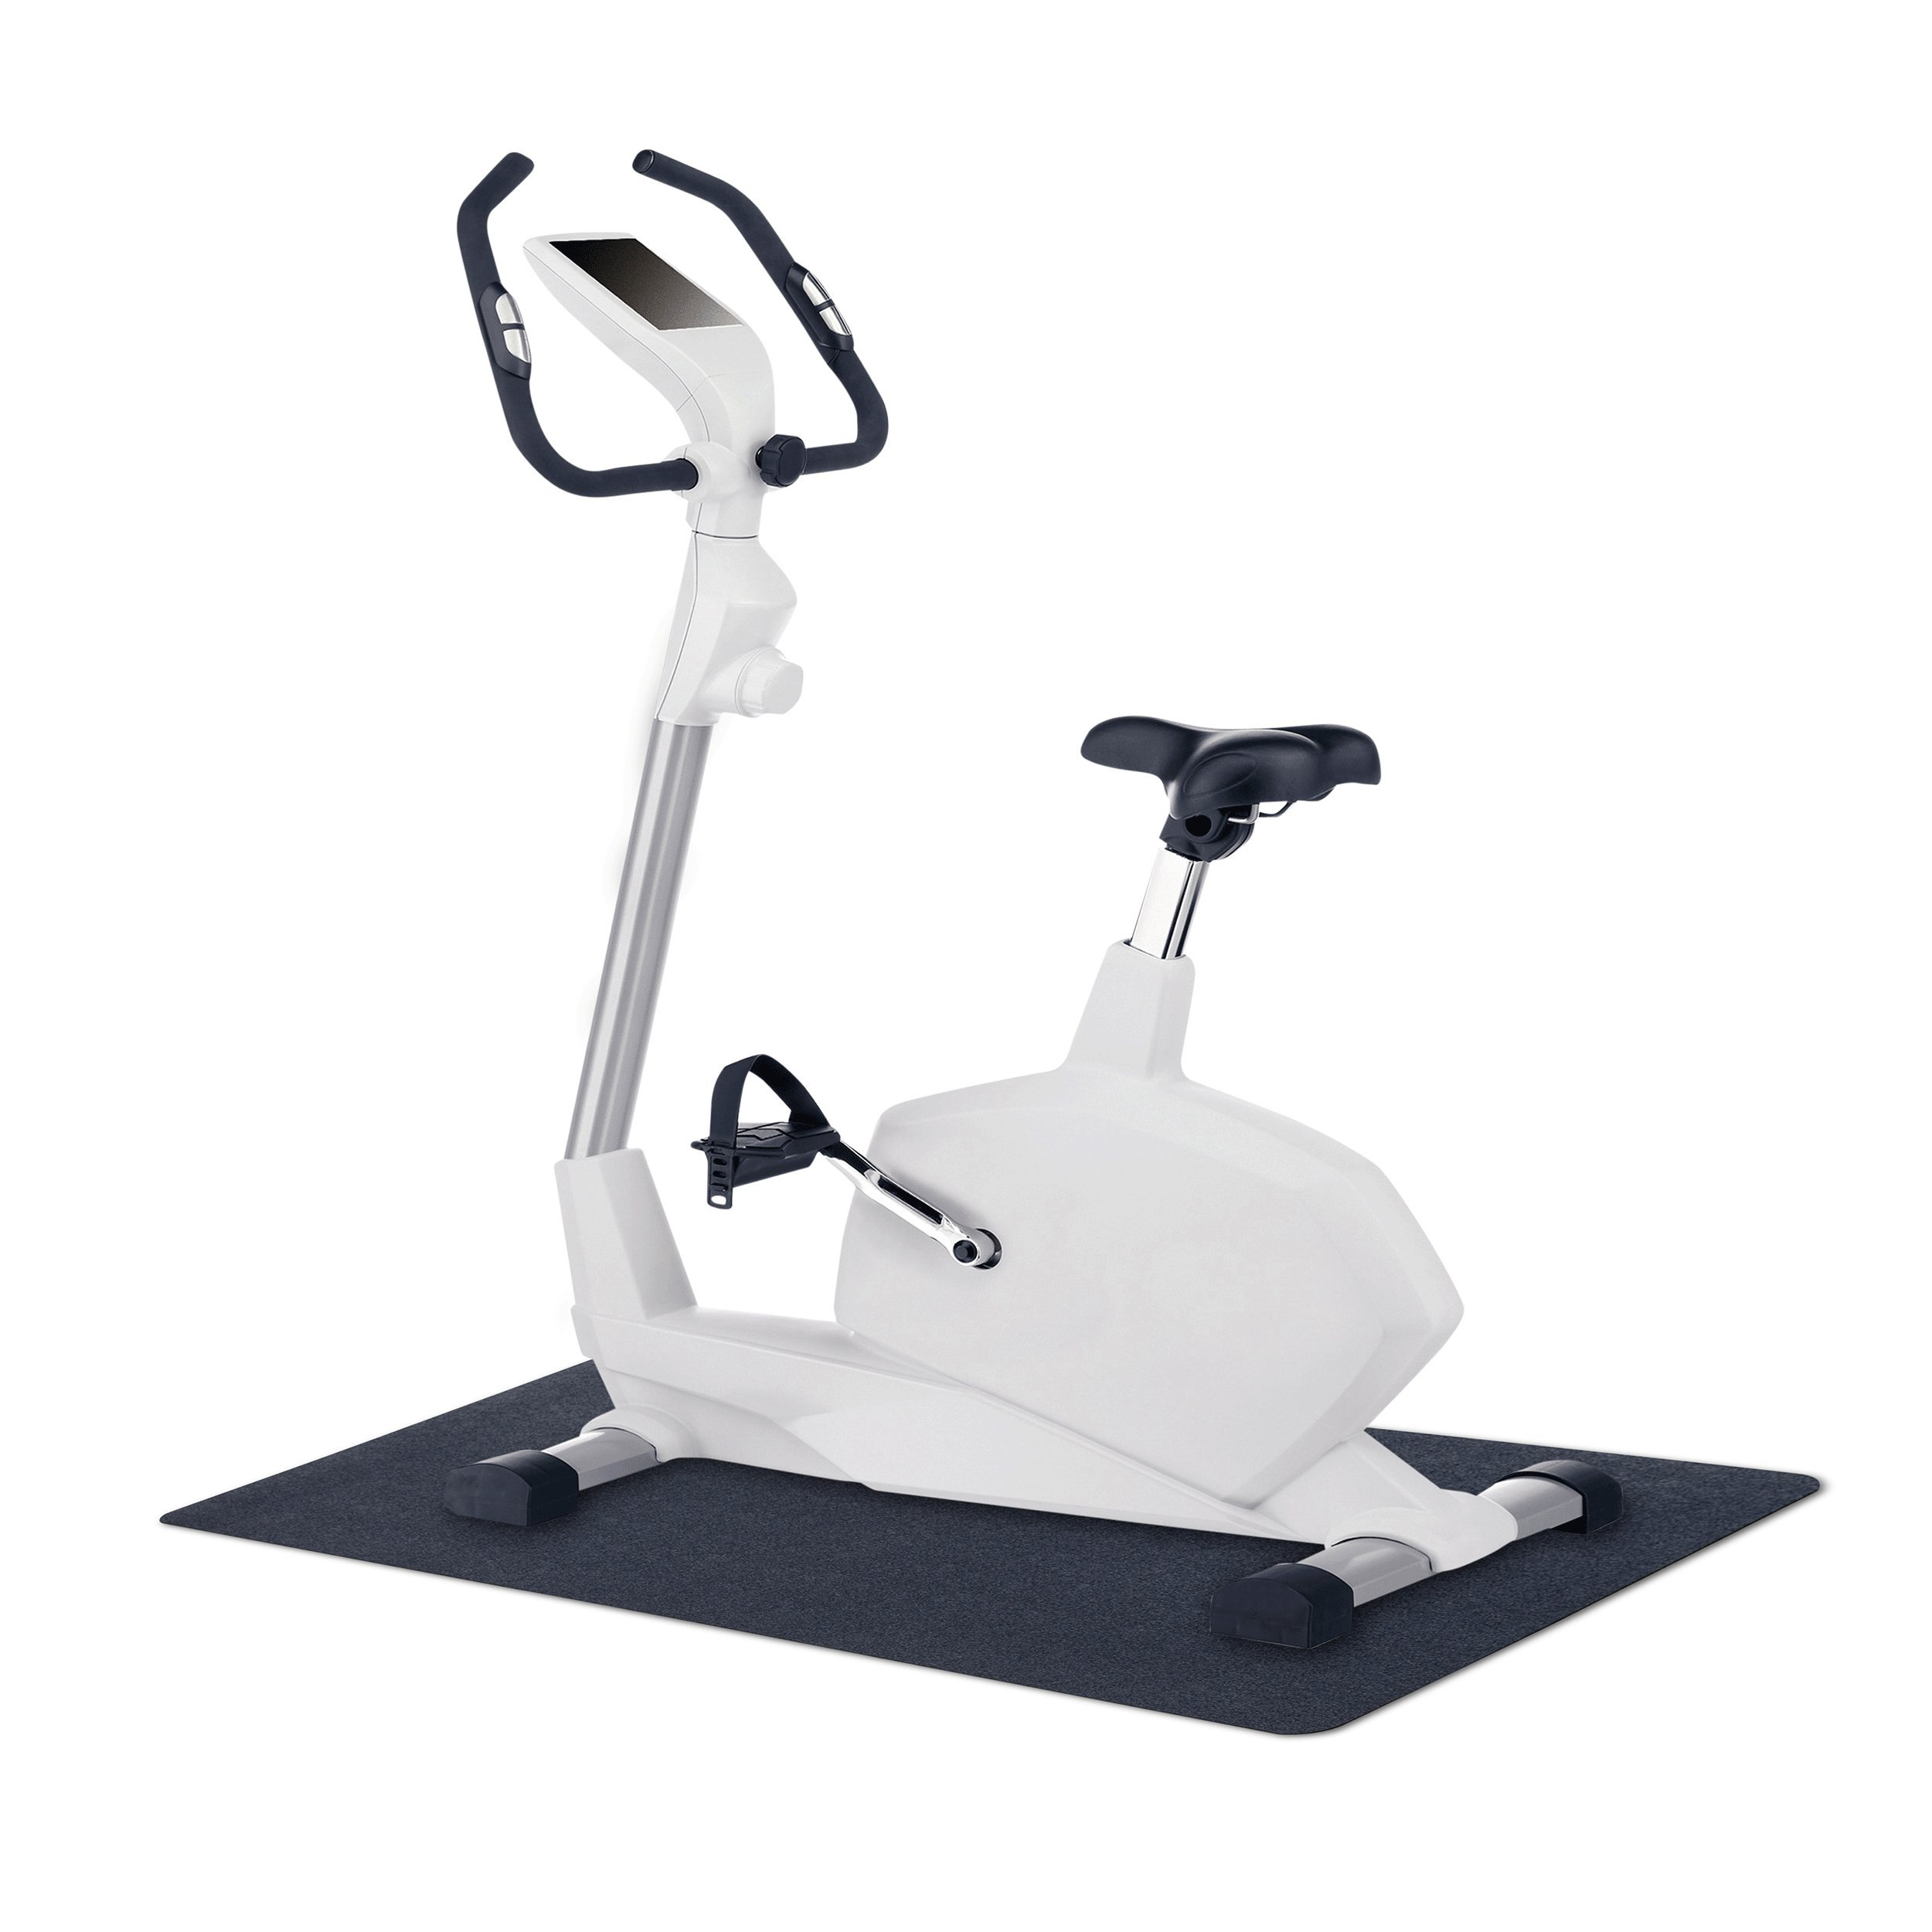 MotionTex 8M-110-24C-4 Fitness Equipment Mat, 24'' x 48'', Black by MotionTex